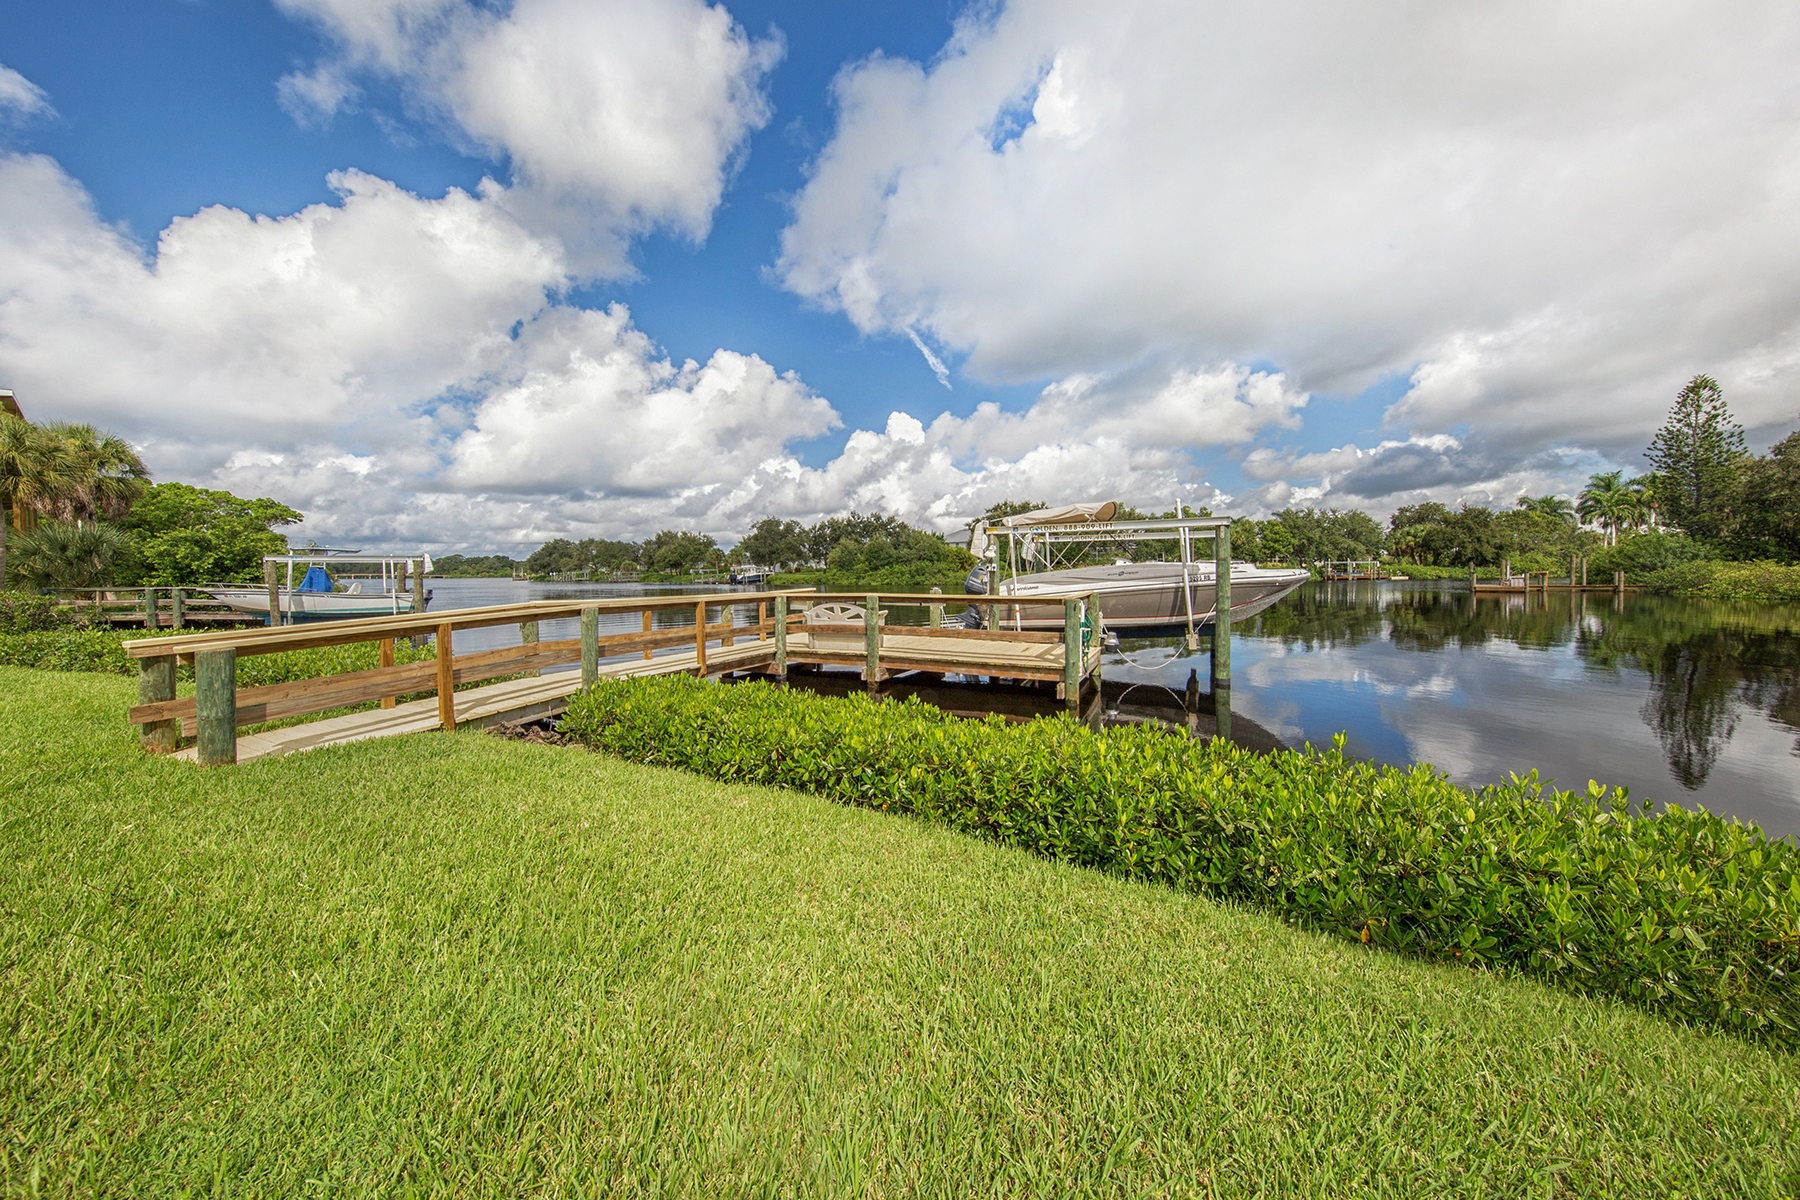 Đất đai vì Bán tại NOKOMIS 904 Lucille Ave 000 Nokomis, Florida, 34275 Hoa Kỳ